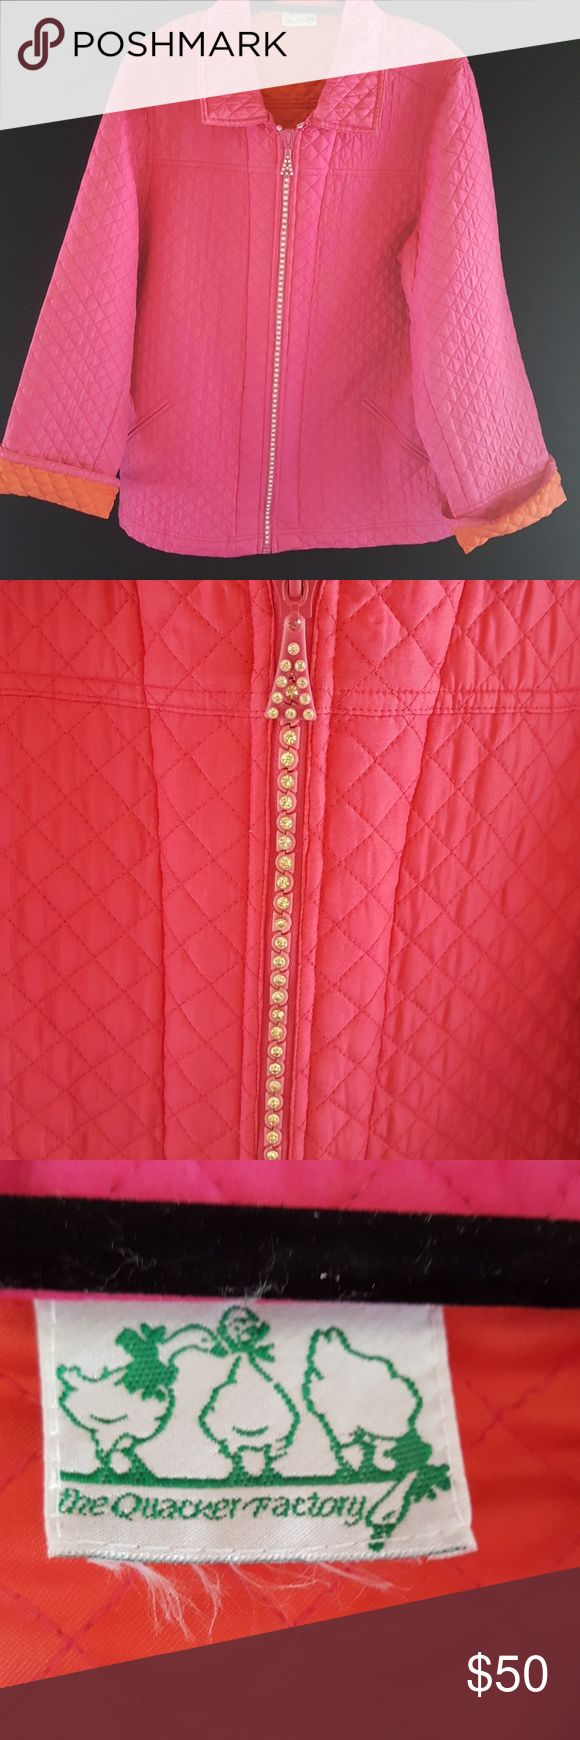 The Quacker Factory pink/orange  jacket The Quacker Factory pink outside/orange lined jacket beautiful diamond/rhinestone embelished zipper the quacker factory Jackets & Coats Puffers